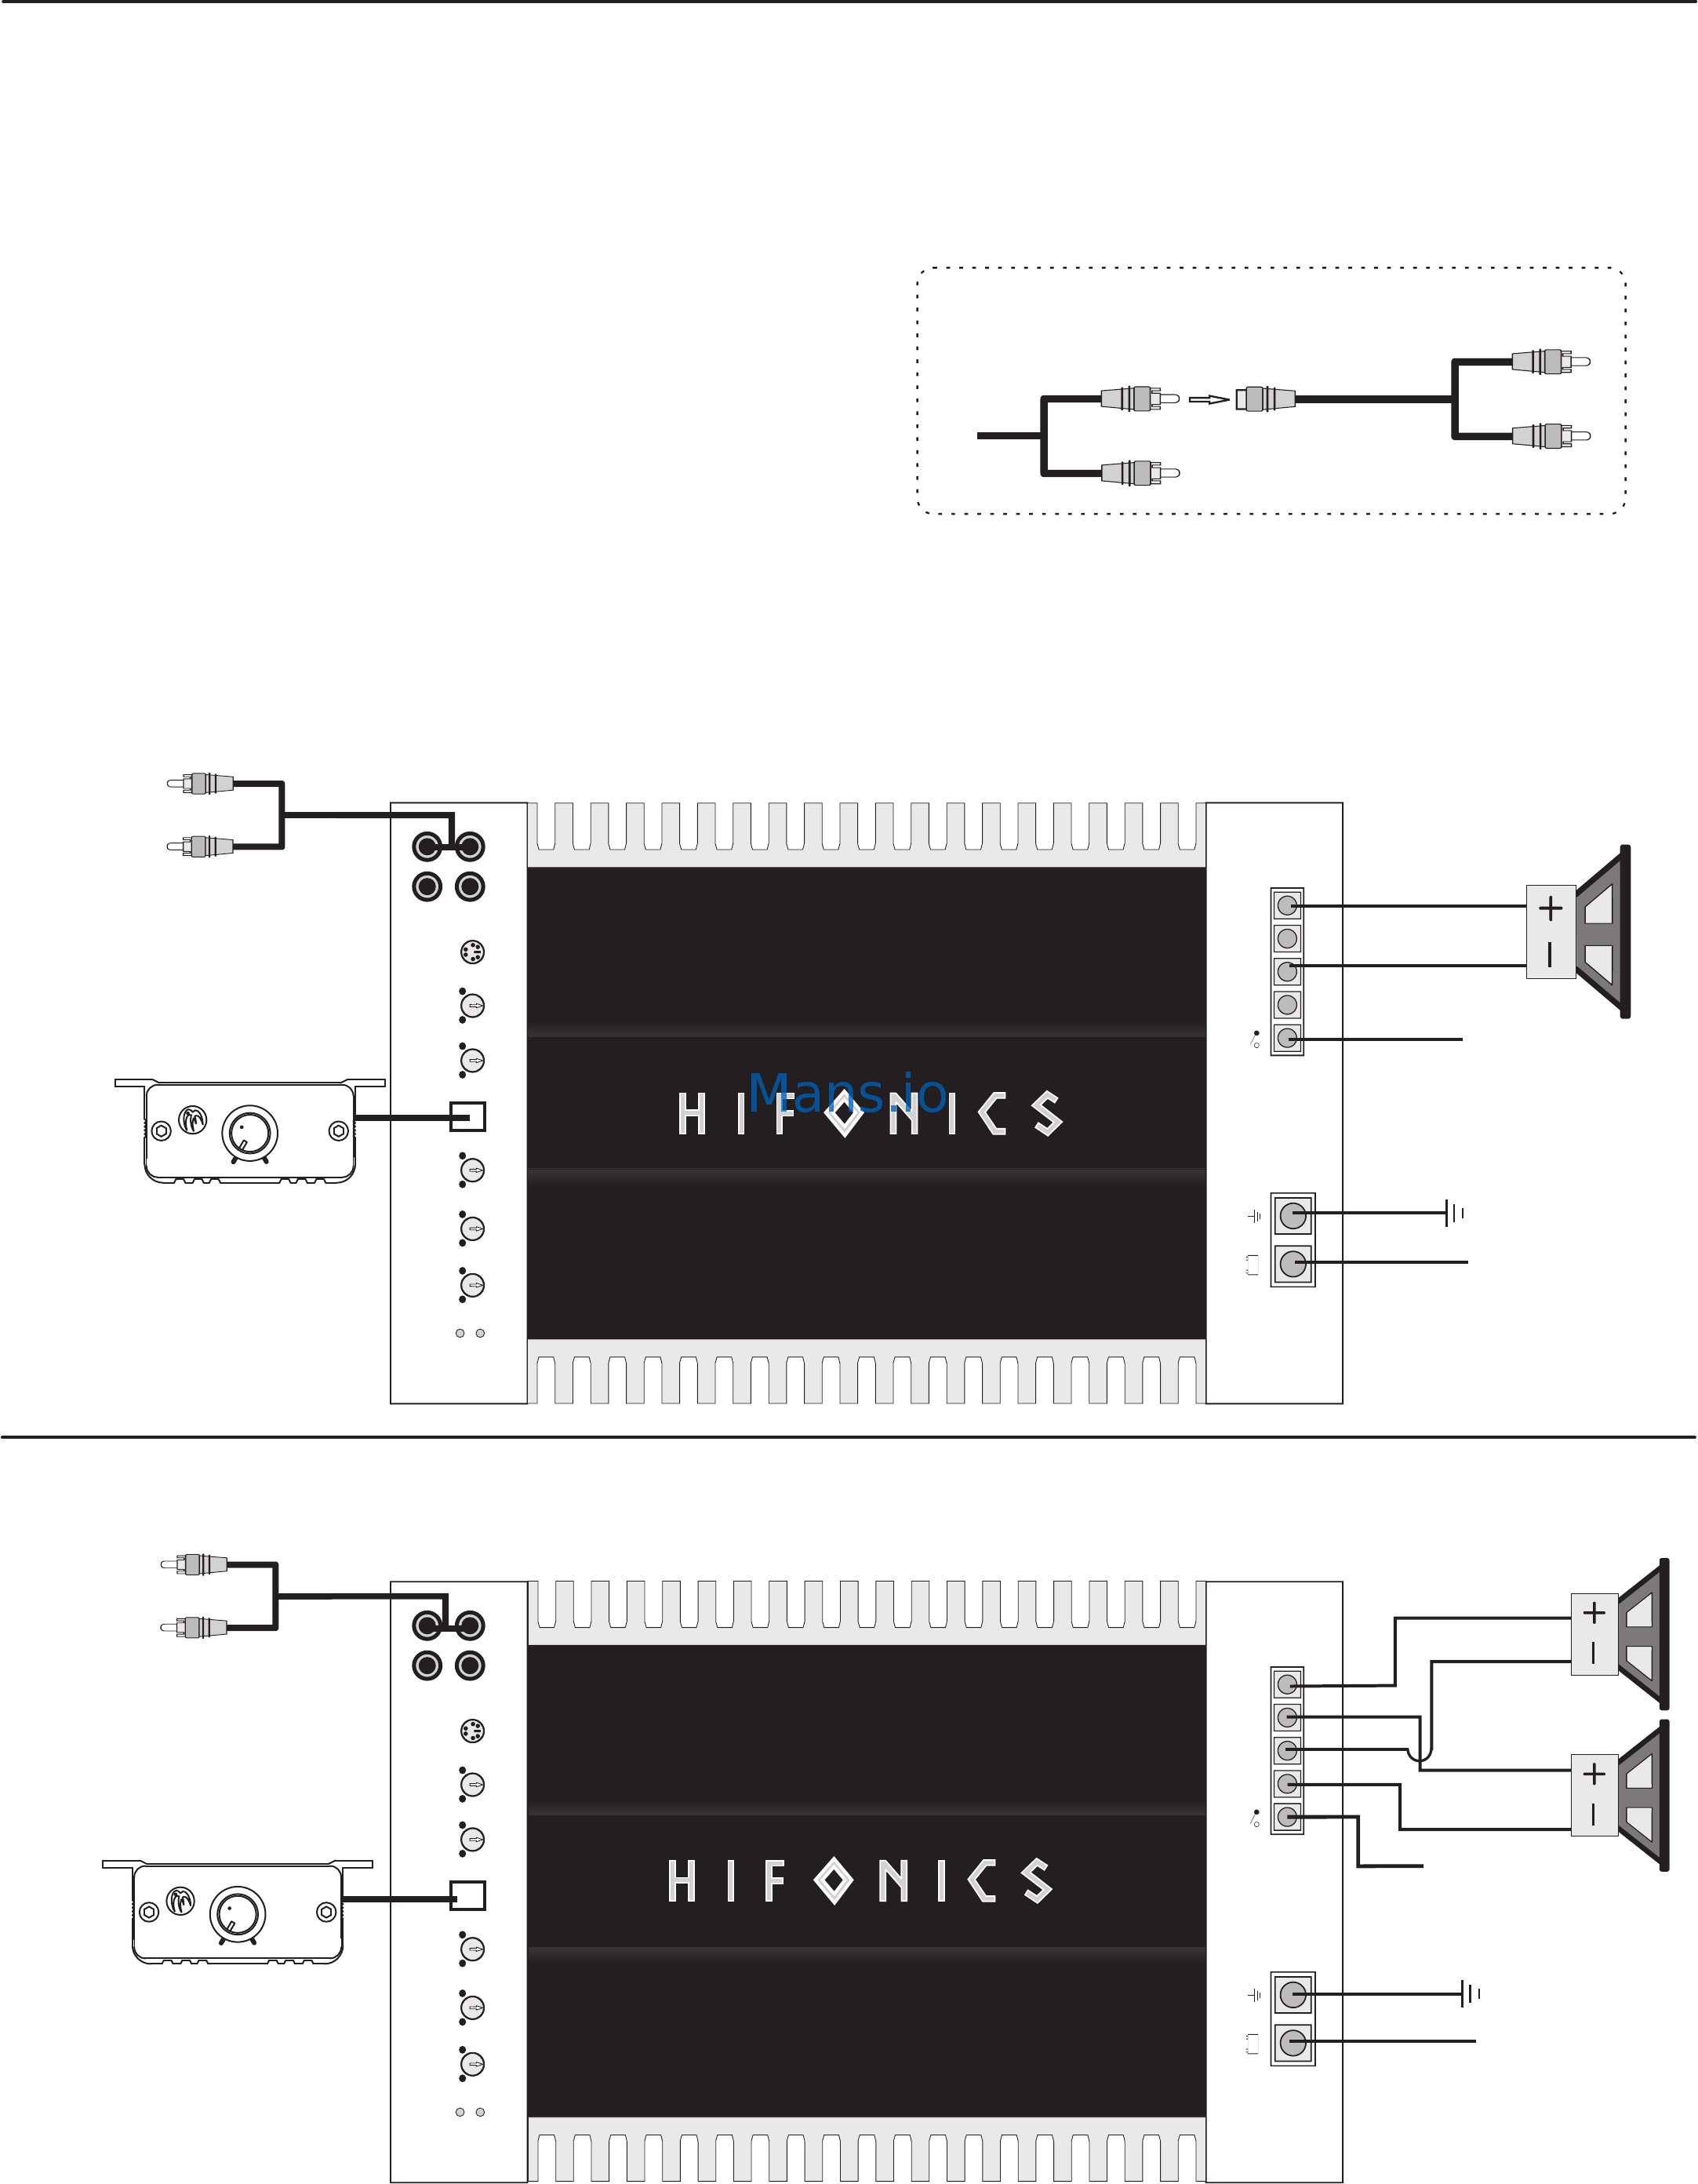 DIAGRAM] Will Burt Detek System Wiring Diagram FULL Version HD Quality Wiring  Diagram - FLOWCHARTDIAGRAM.MUSEOBUAP.MX   Will Burt Detek System Wiring Diagram      flowchartdiagram.museobuap.mx